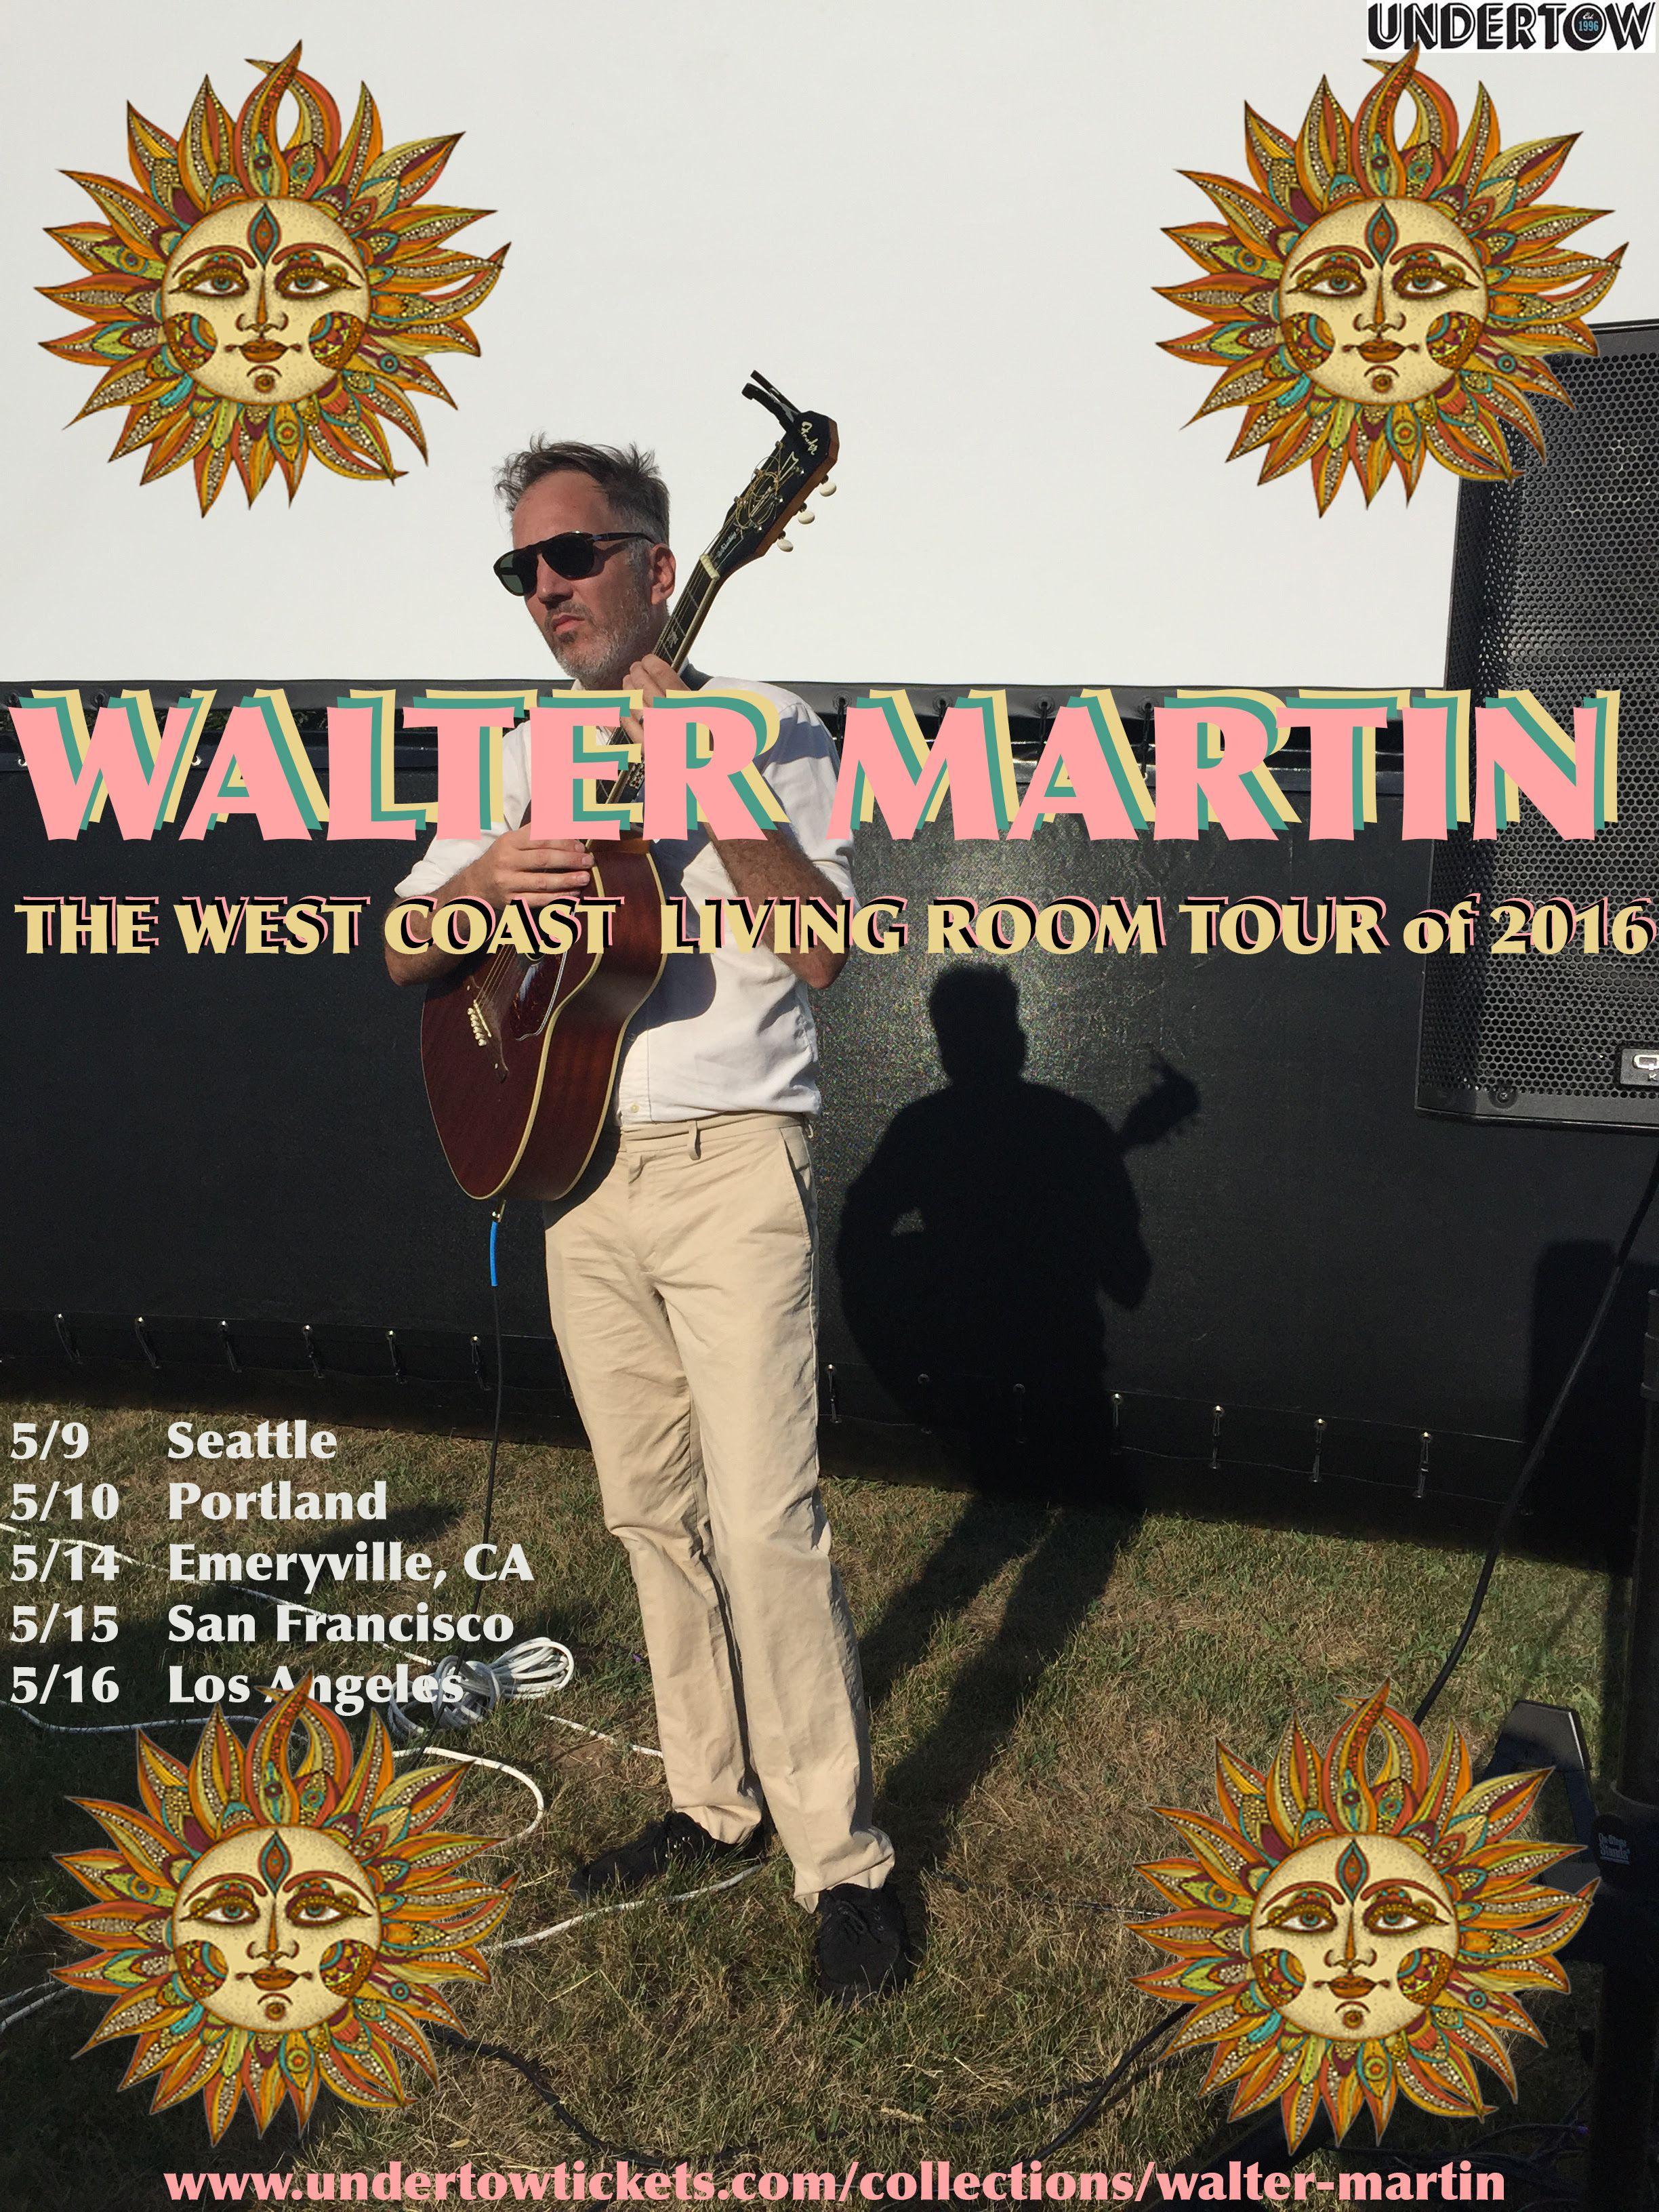 GoRockfest.Com: Walter Martin Tour Dates 2016